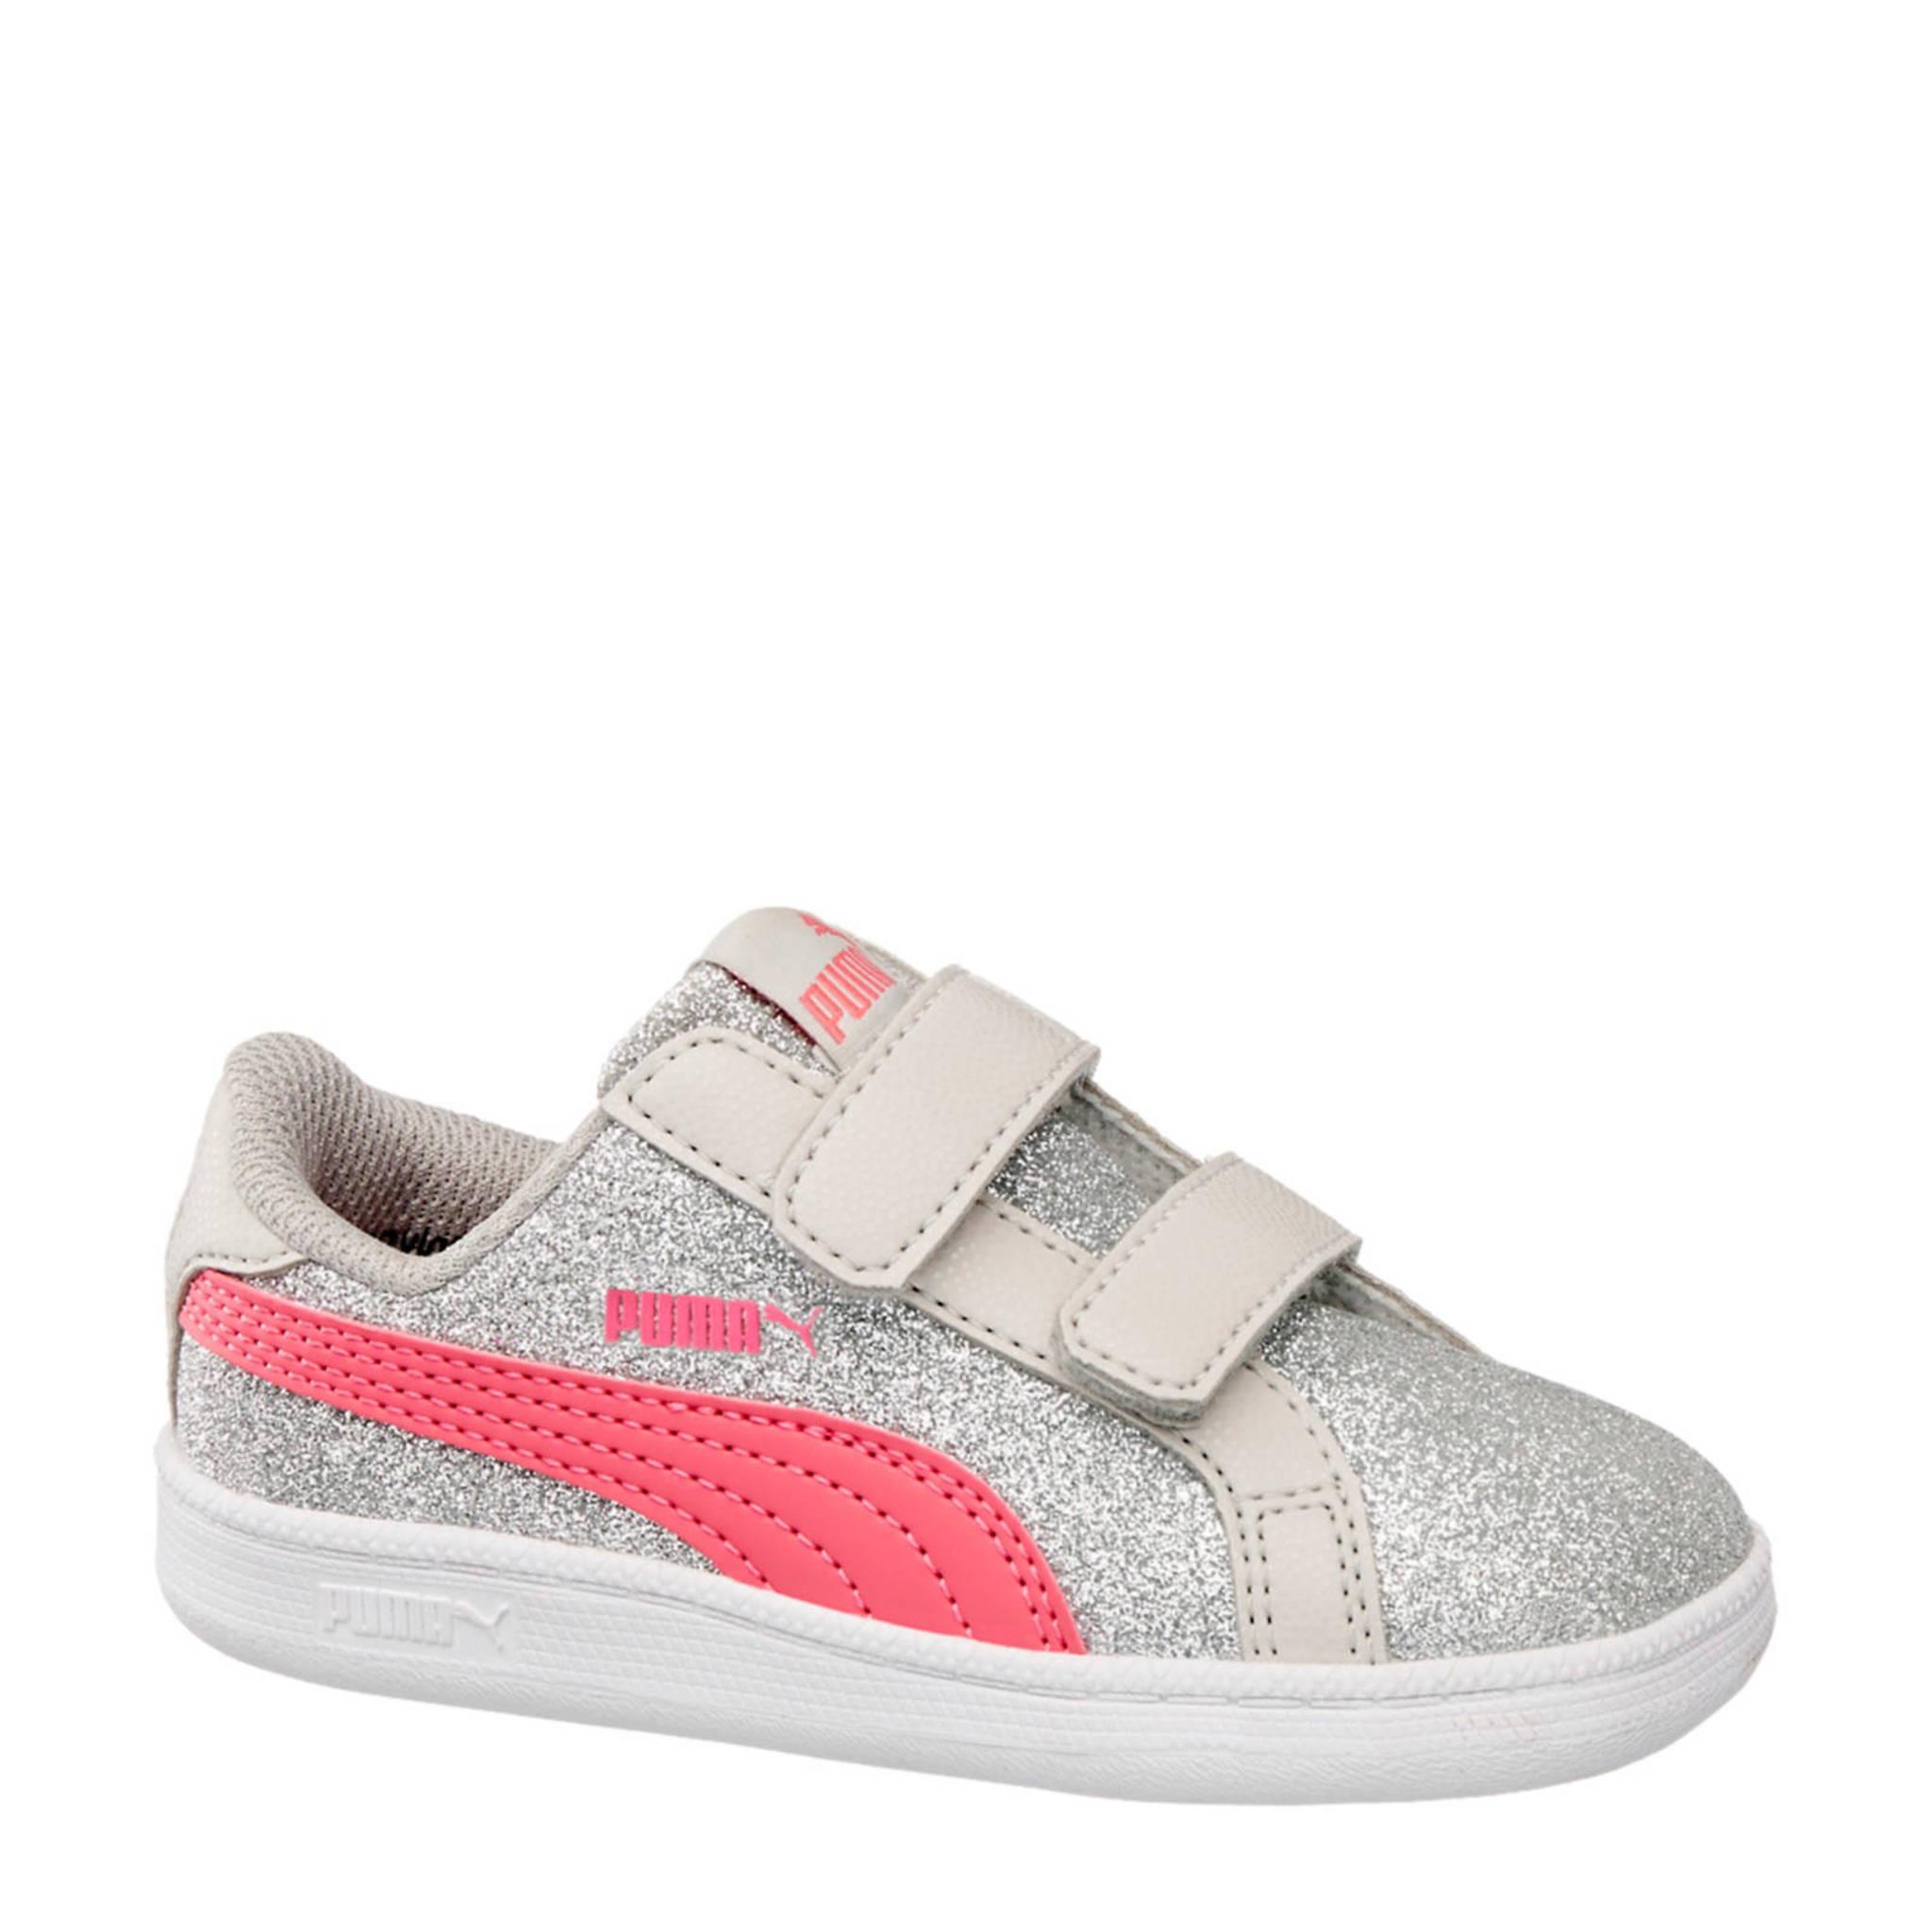 ccda221f546 Puma Smash Glitter glitter sneaker | wehkamp